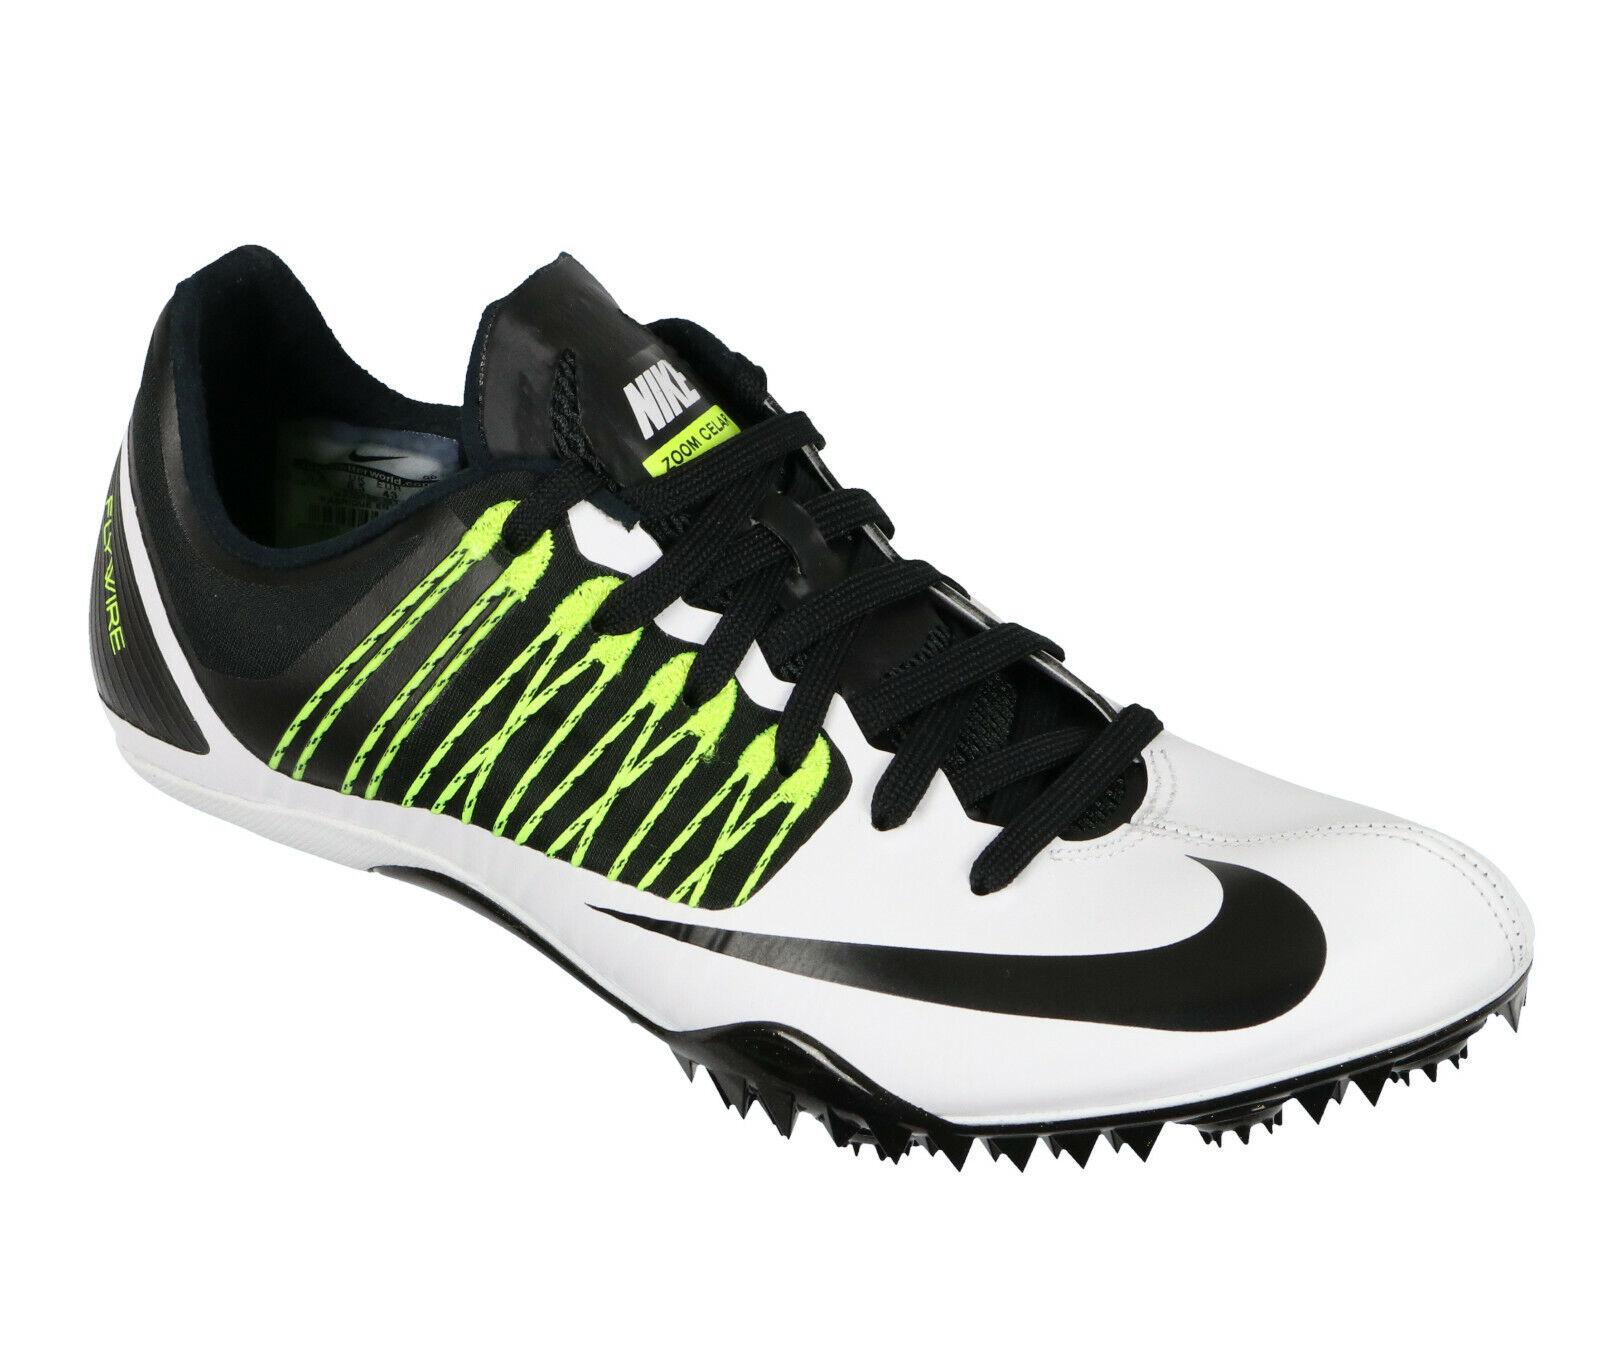 NIKE Zoom Celar 5 Track Field Spikes sz 9.5 White Black Volt Cleats Training